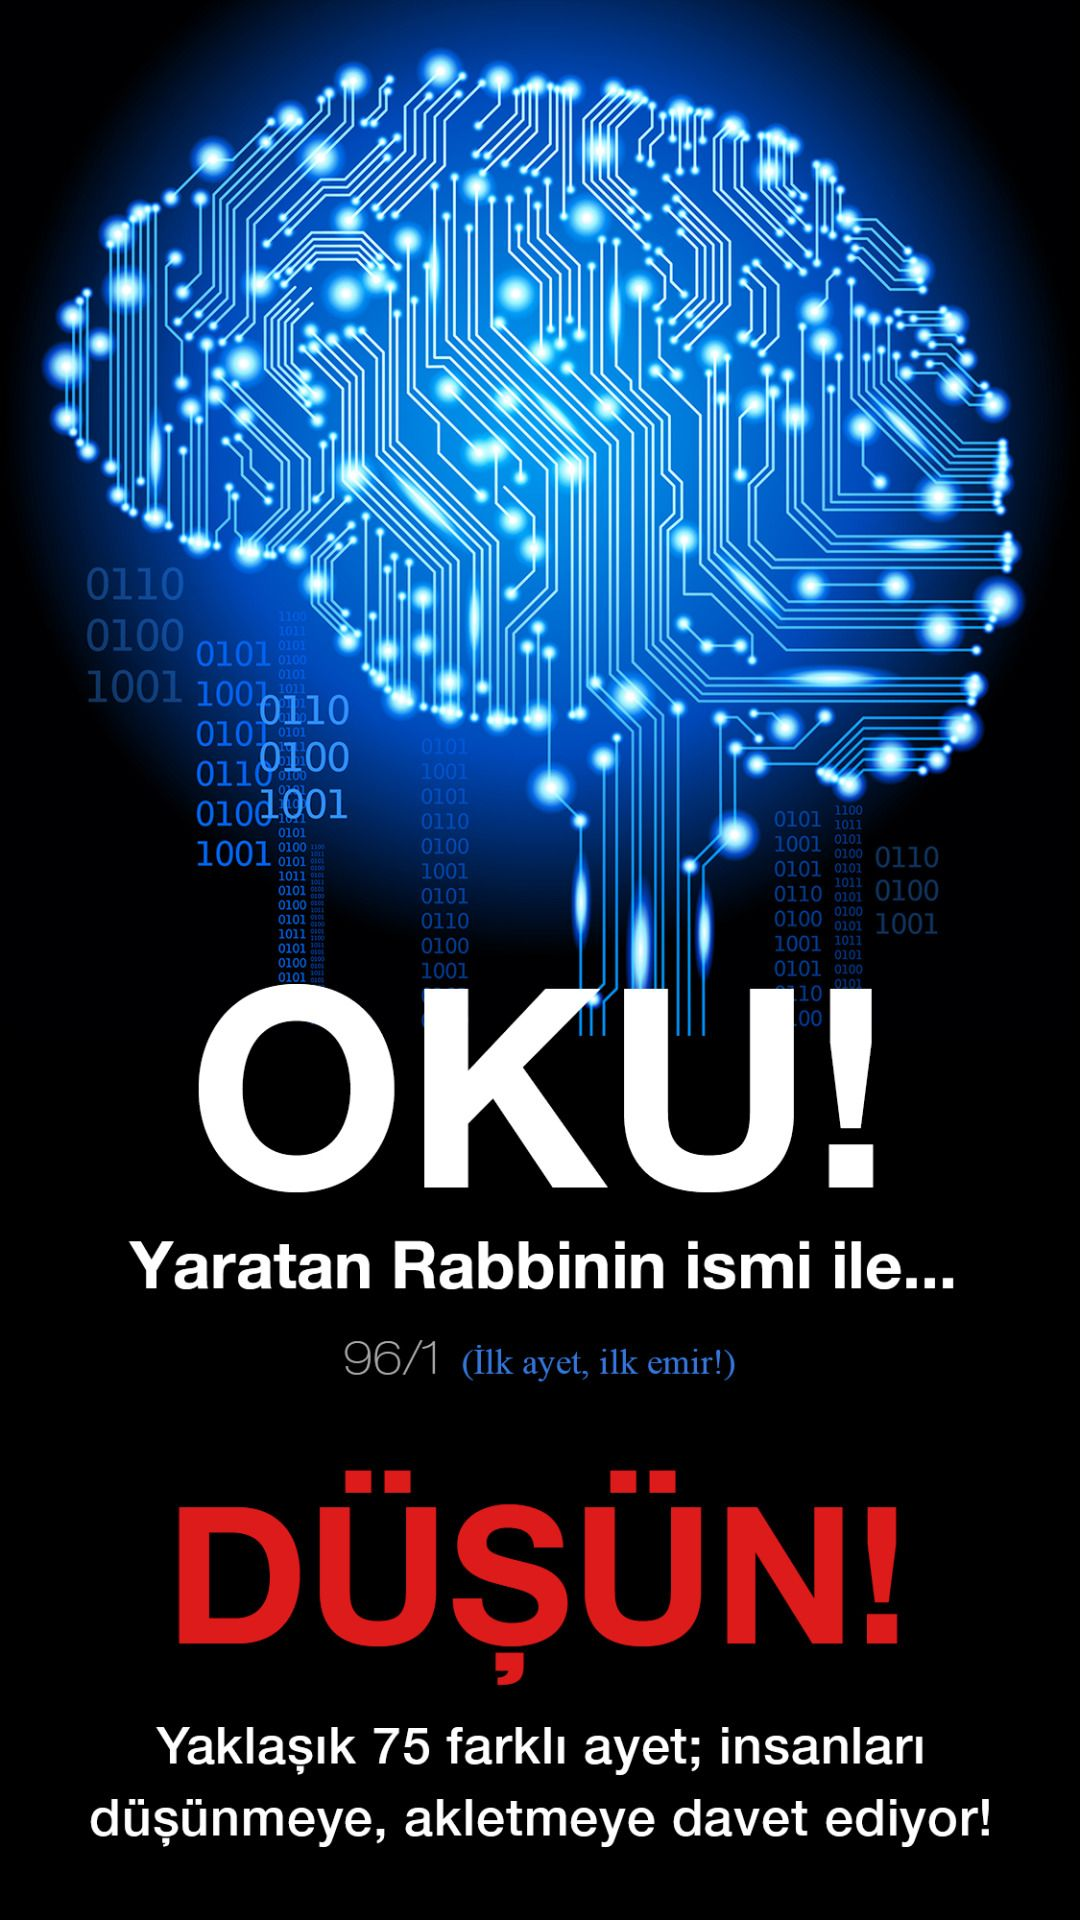 Wallpapers iphone quran - Islam Quran Holy Quran Kur An Kuran Verse Ayet